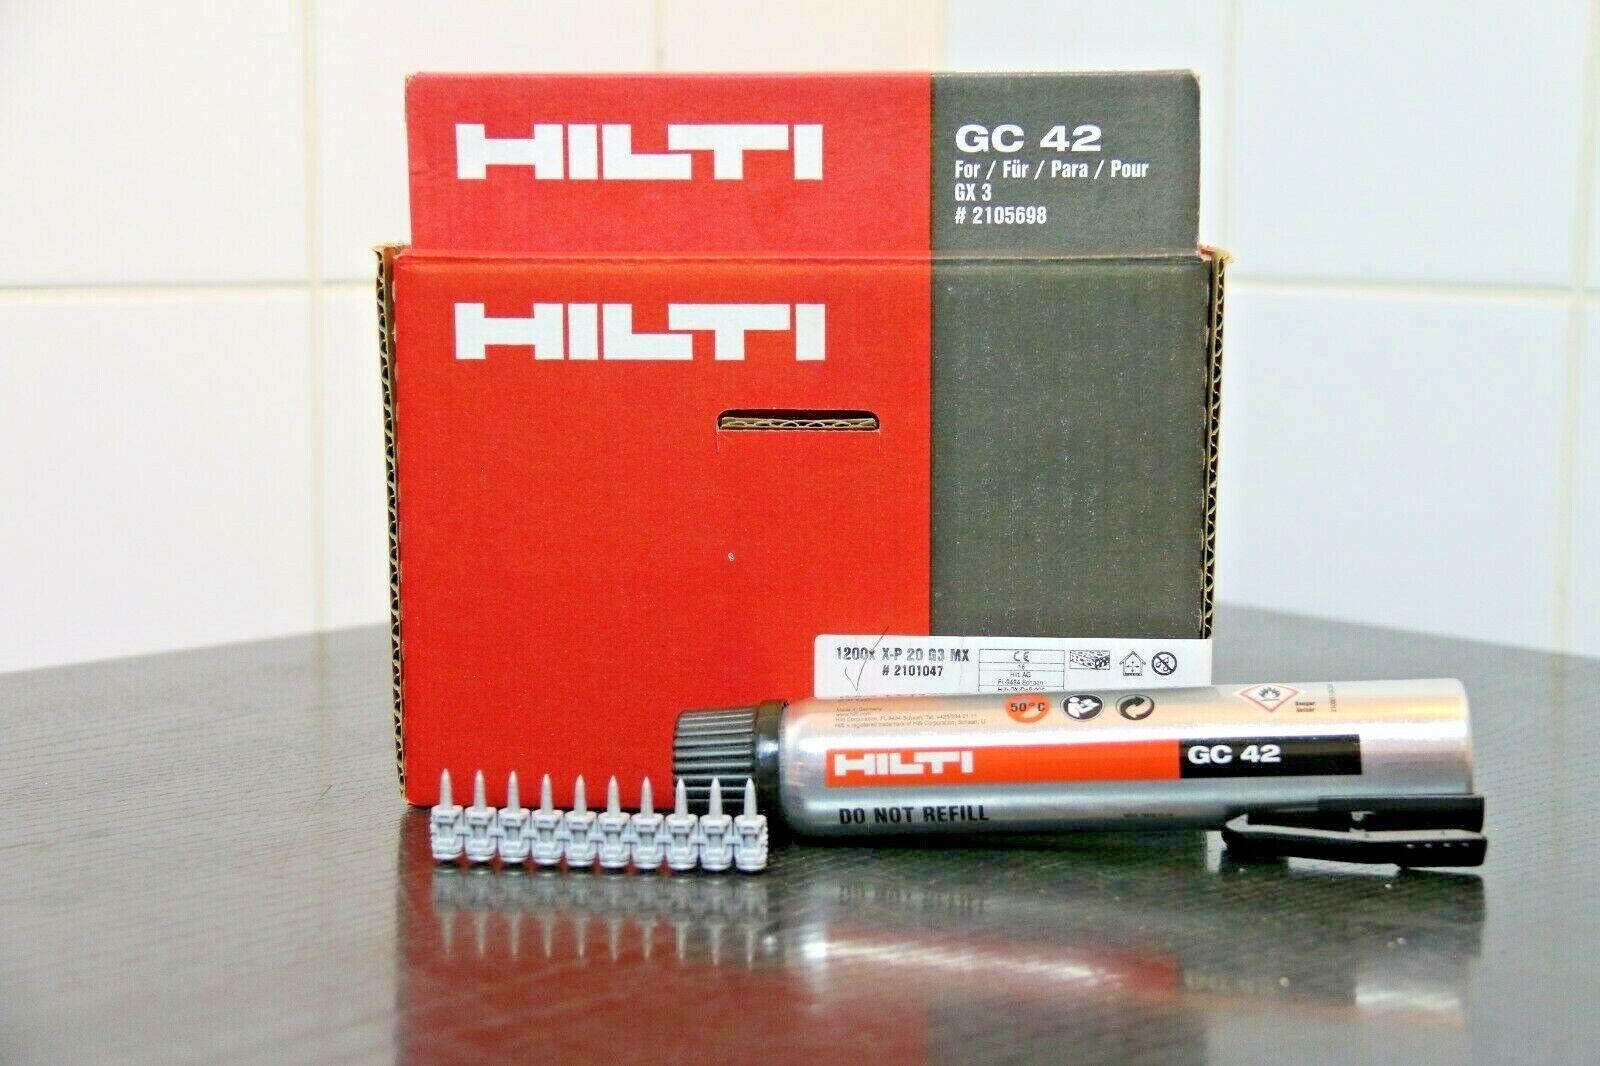 HILTI 1200 Stk magaziniert NAGEL Nägel X-P 20 G3 MX 20mm + GC 42 Gas STARK Beton